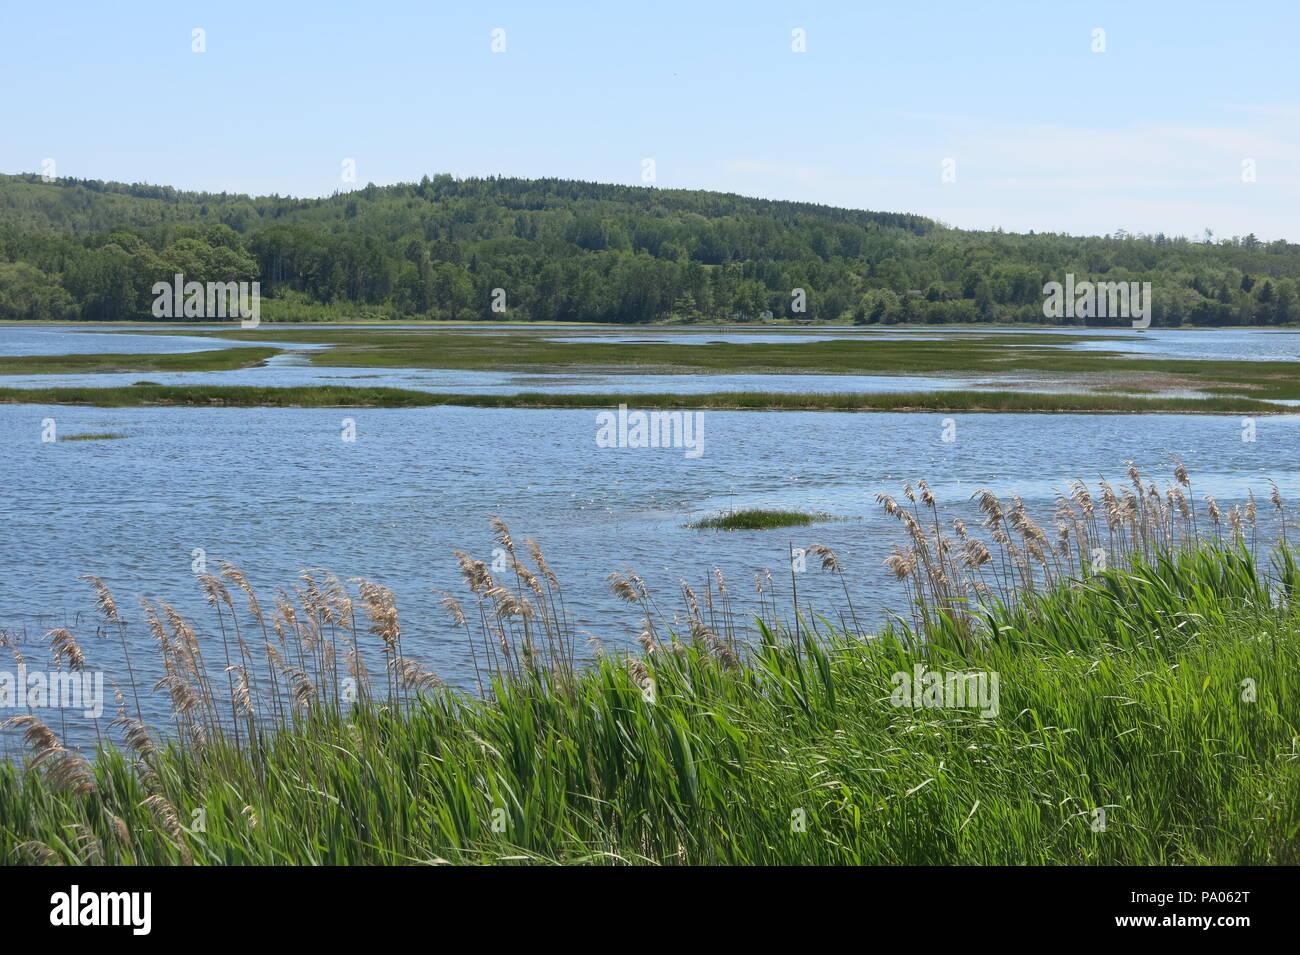 A stroll along the dyke walk gives beautiful views of the grass habitat and salt marshes; the Historic Gardens at Annapolis Royal, Nova Scotia Stock Photo